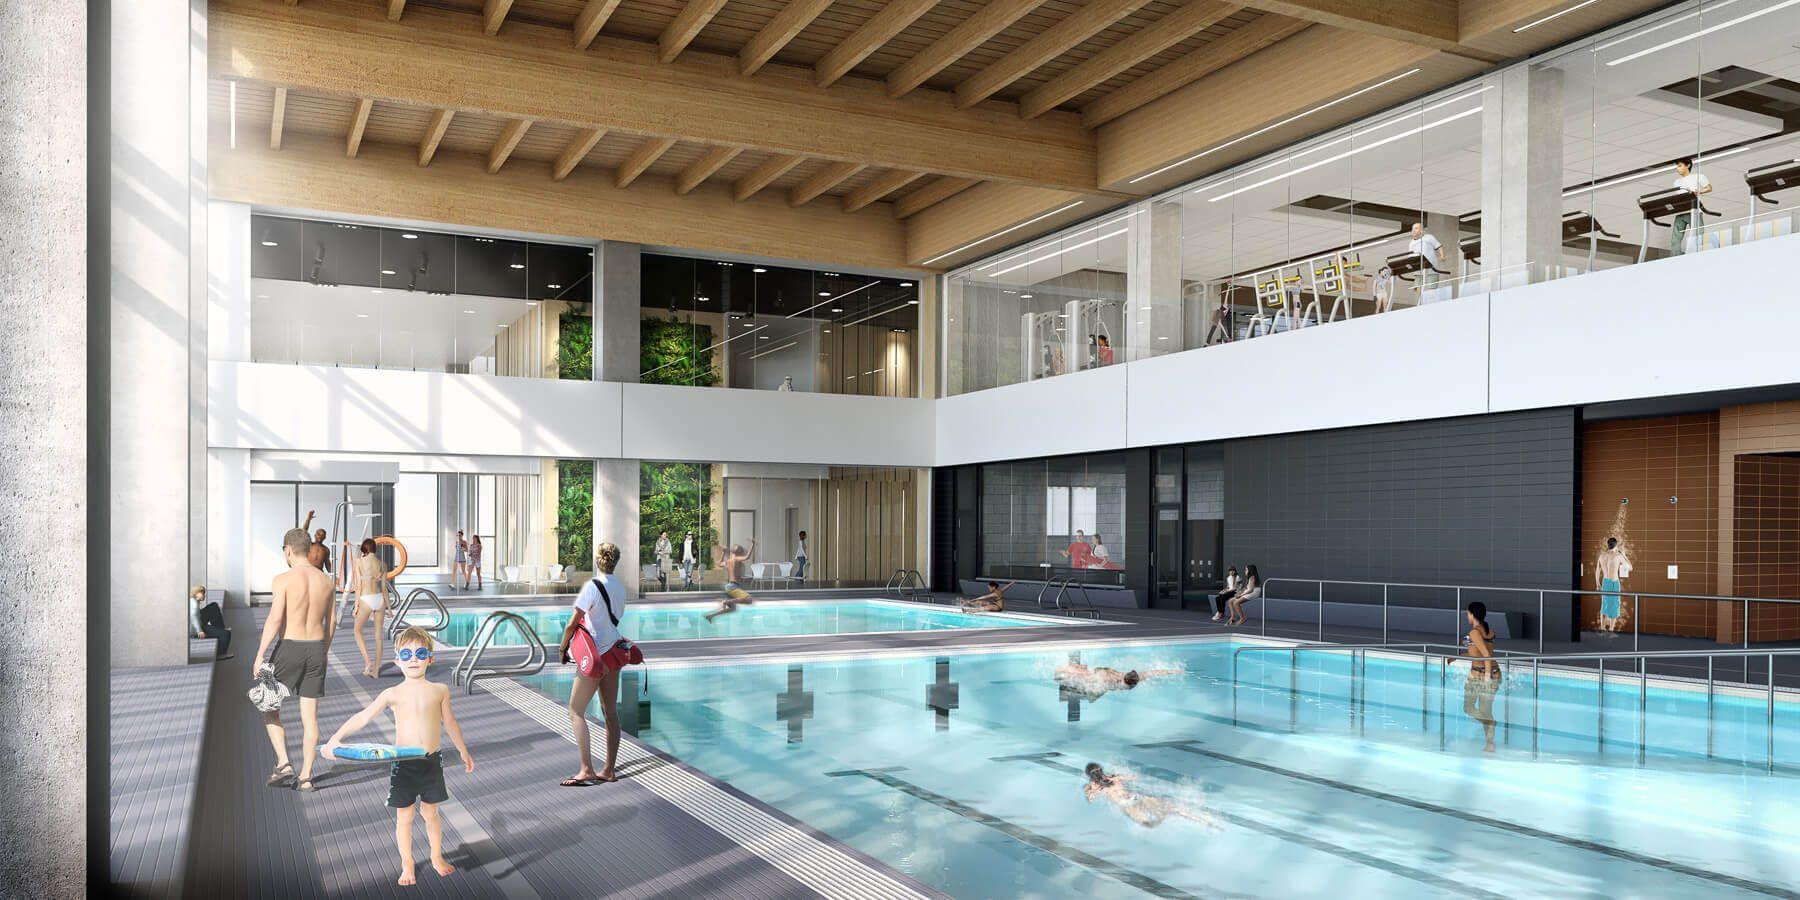 Maclennan Jaunkalns Miller Architects Vaughan Metropolitan Centre Interiors Indoor Surf Pool Indoor Swimming Pools Architecture